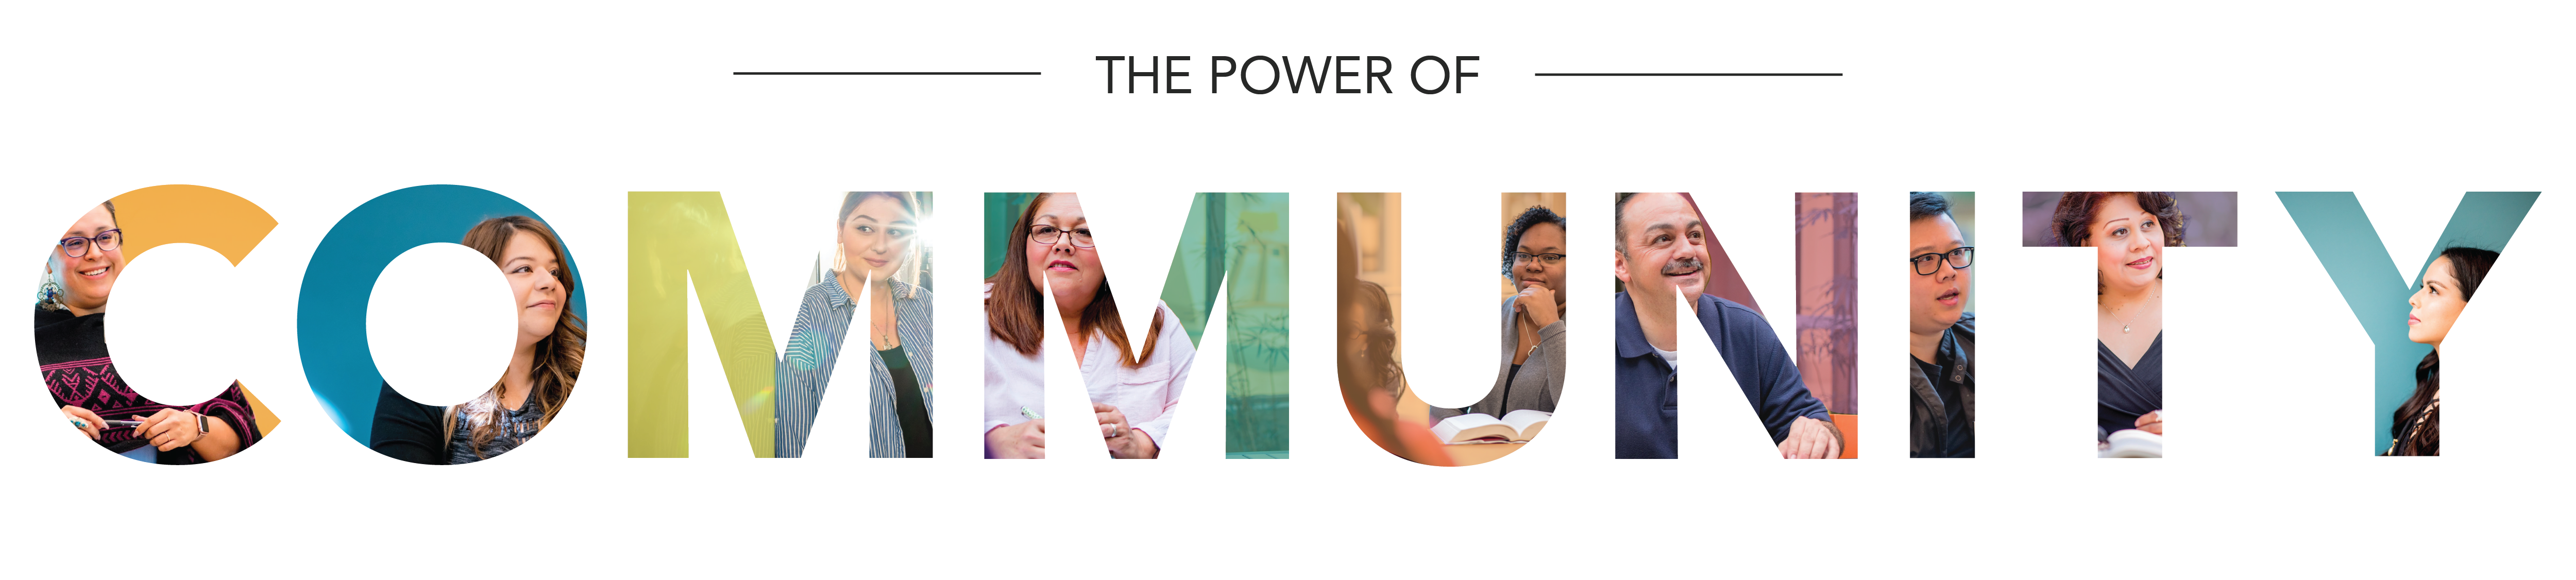 The Power of Community logo